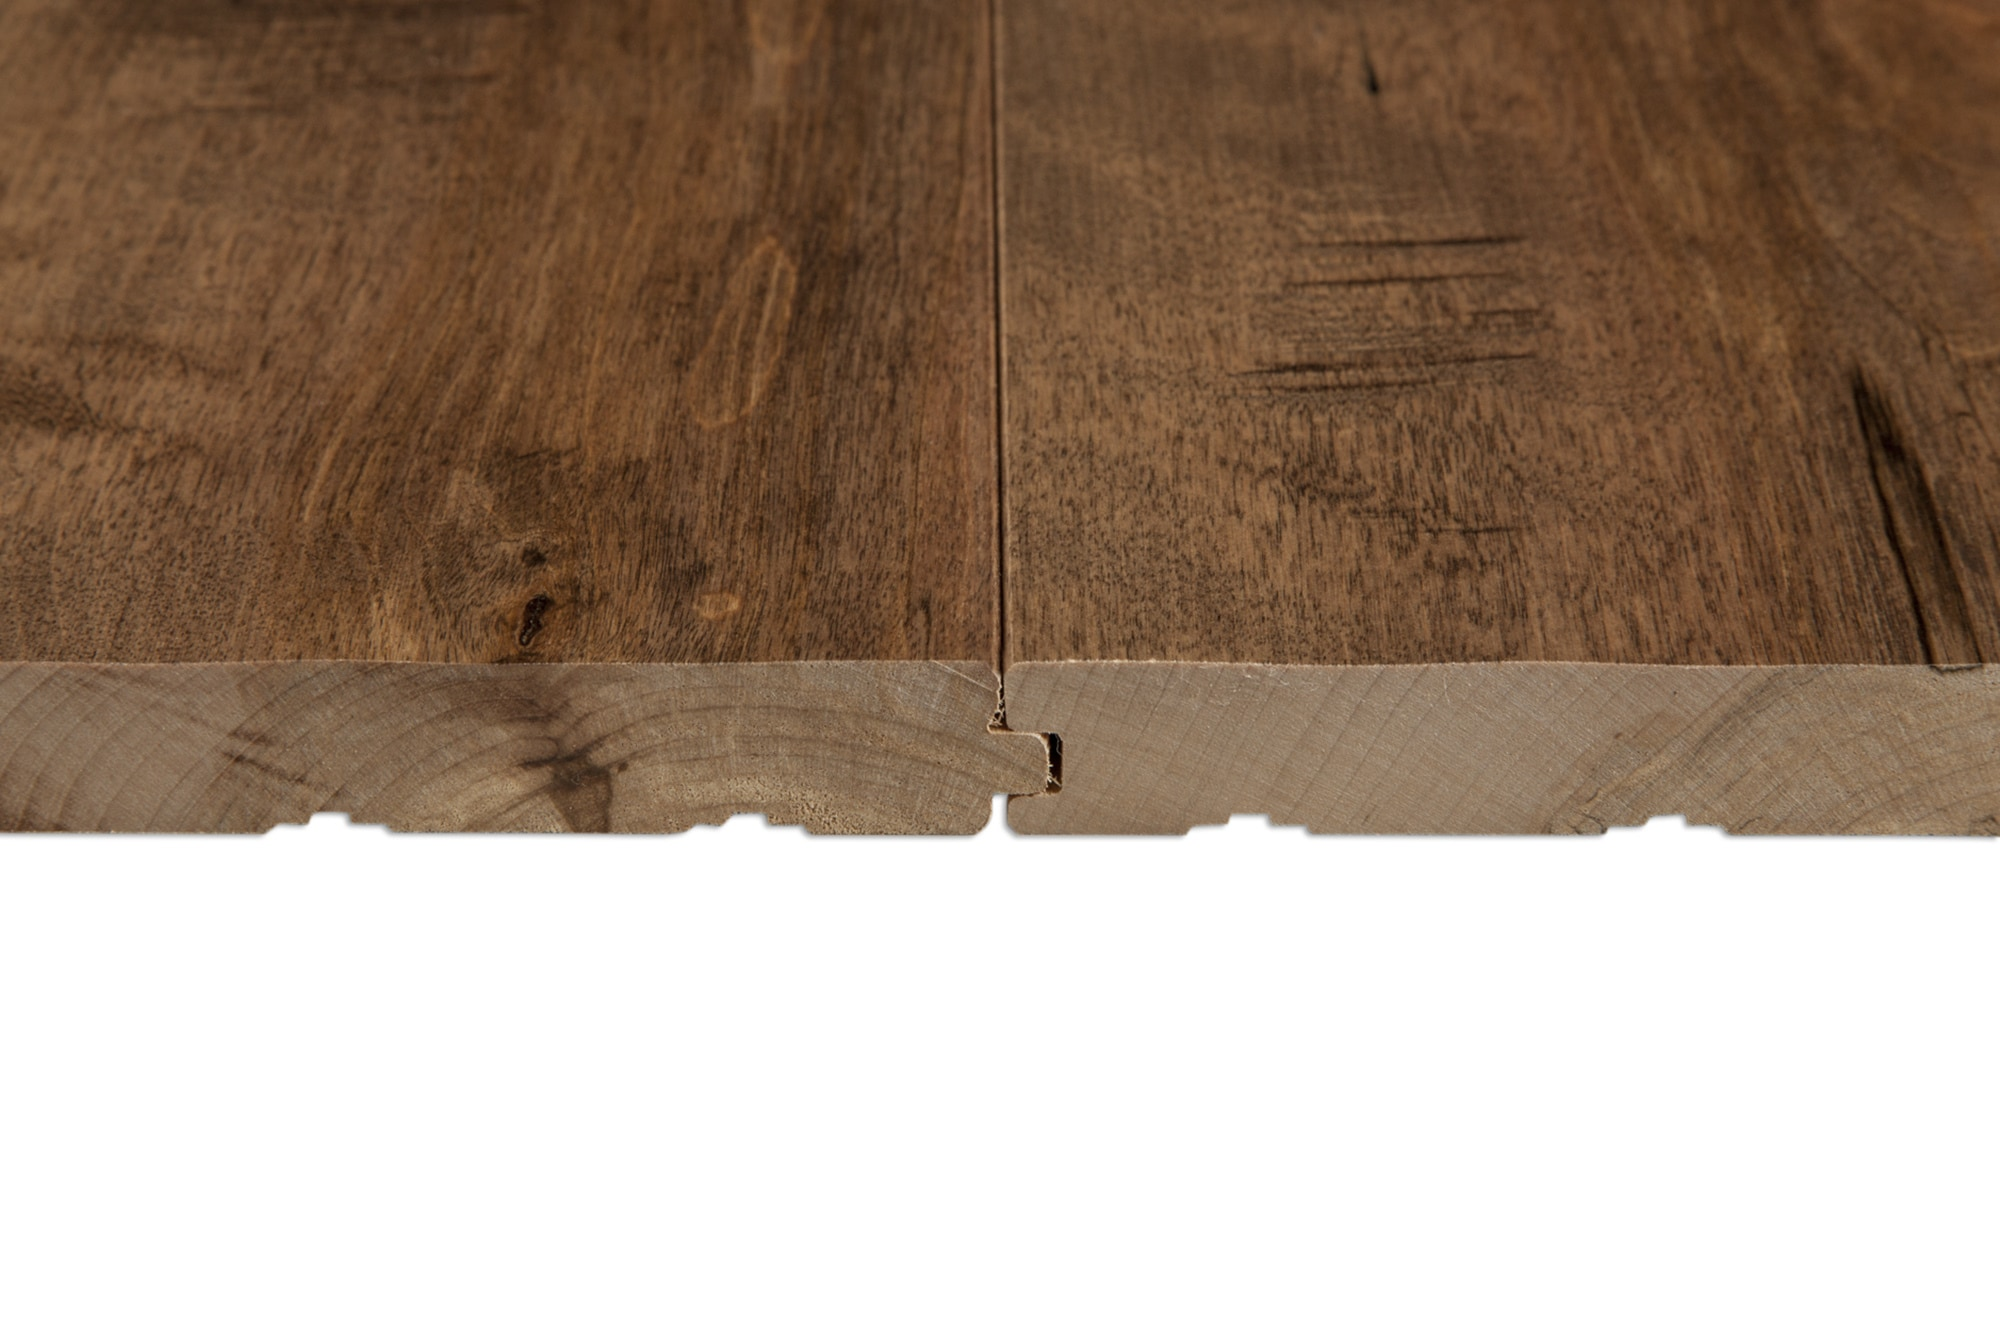 Century Hardwood Flooring room scene Free Samples Mazama Hardwood Handscraped Tropical Collection Maple Century 5 Random Length